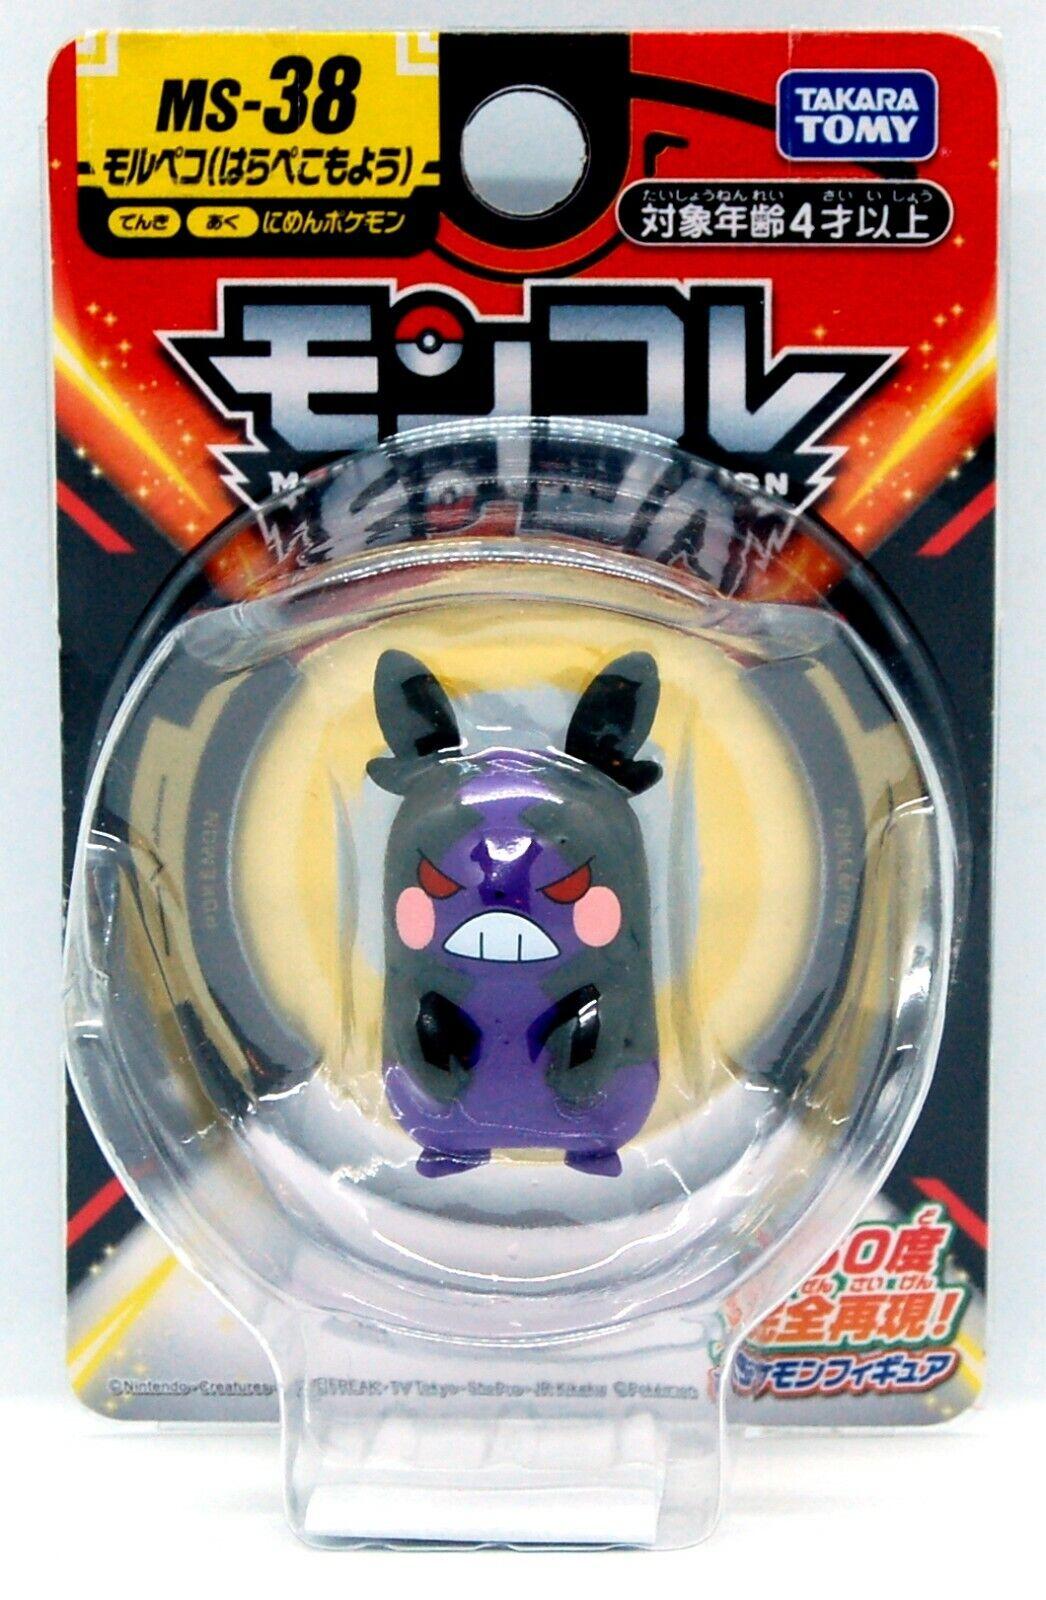 Pokemon Moncolle MS-38 Morpeko Figure Japan NEW TAKARA TOMY